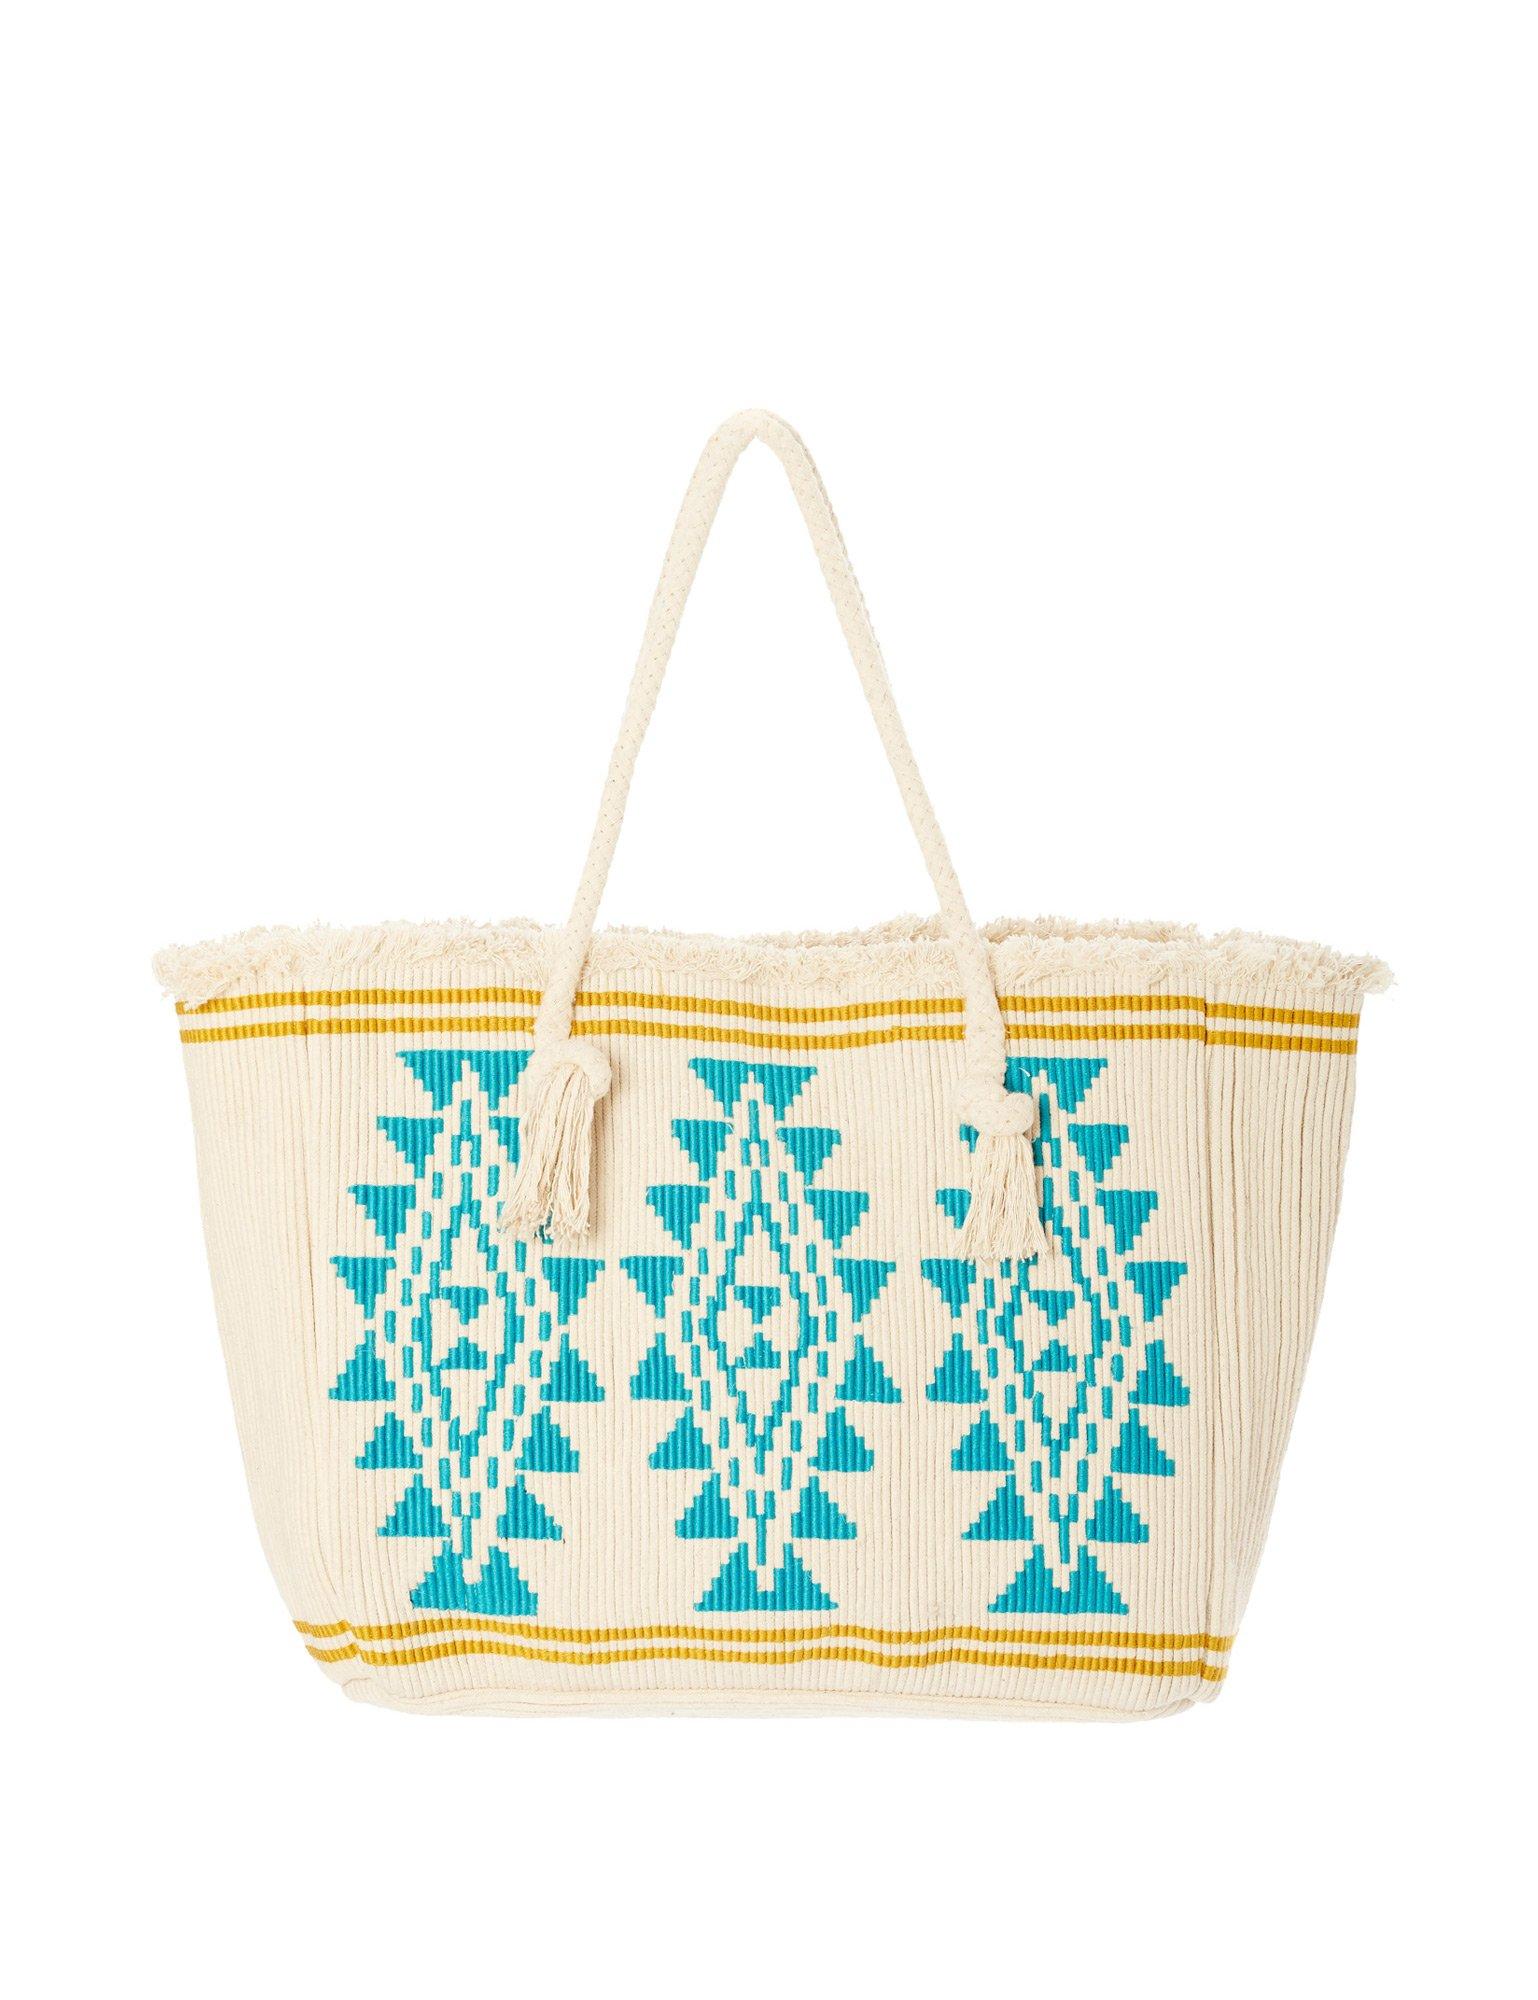 Star Mela Women's Io Women's Ivory-Turquoise Tote Beach Bag 100% Cotton